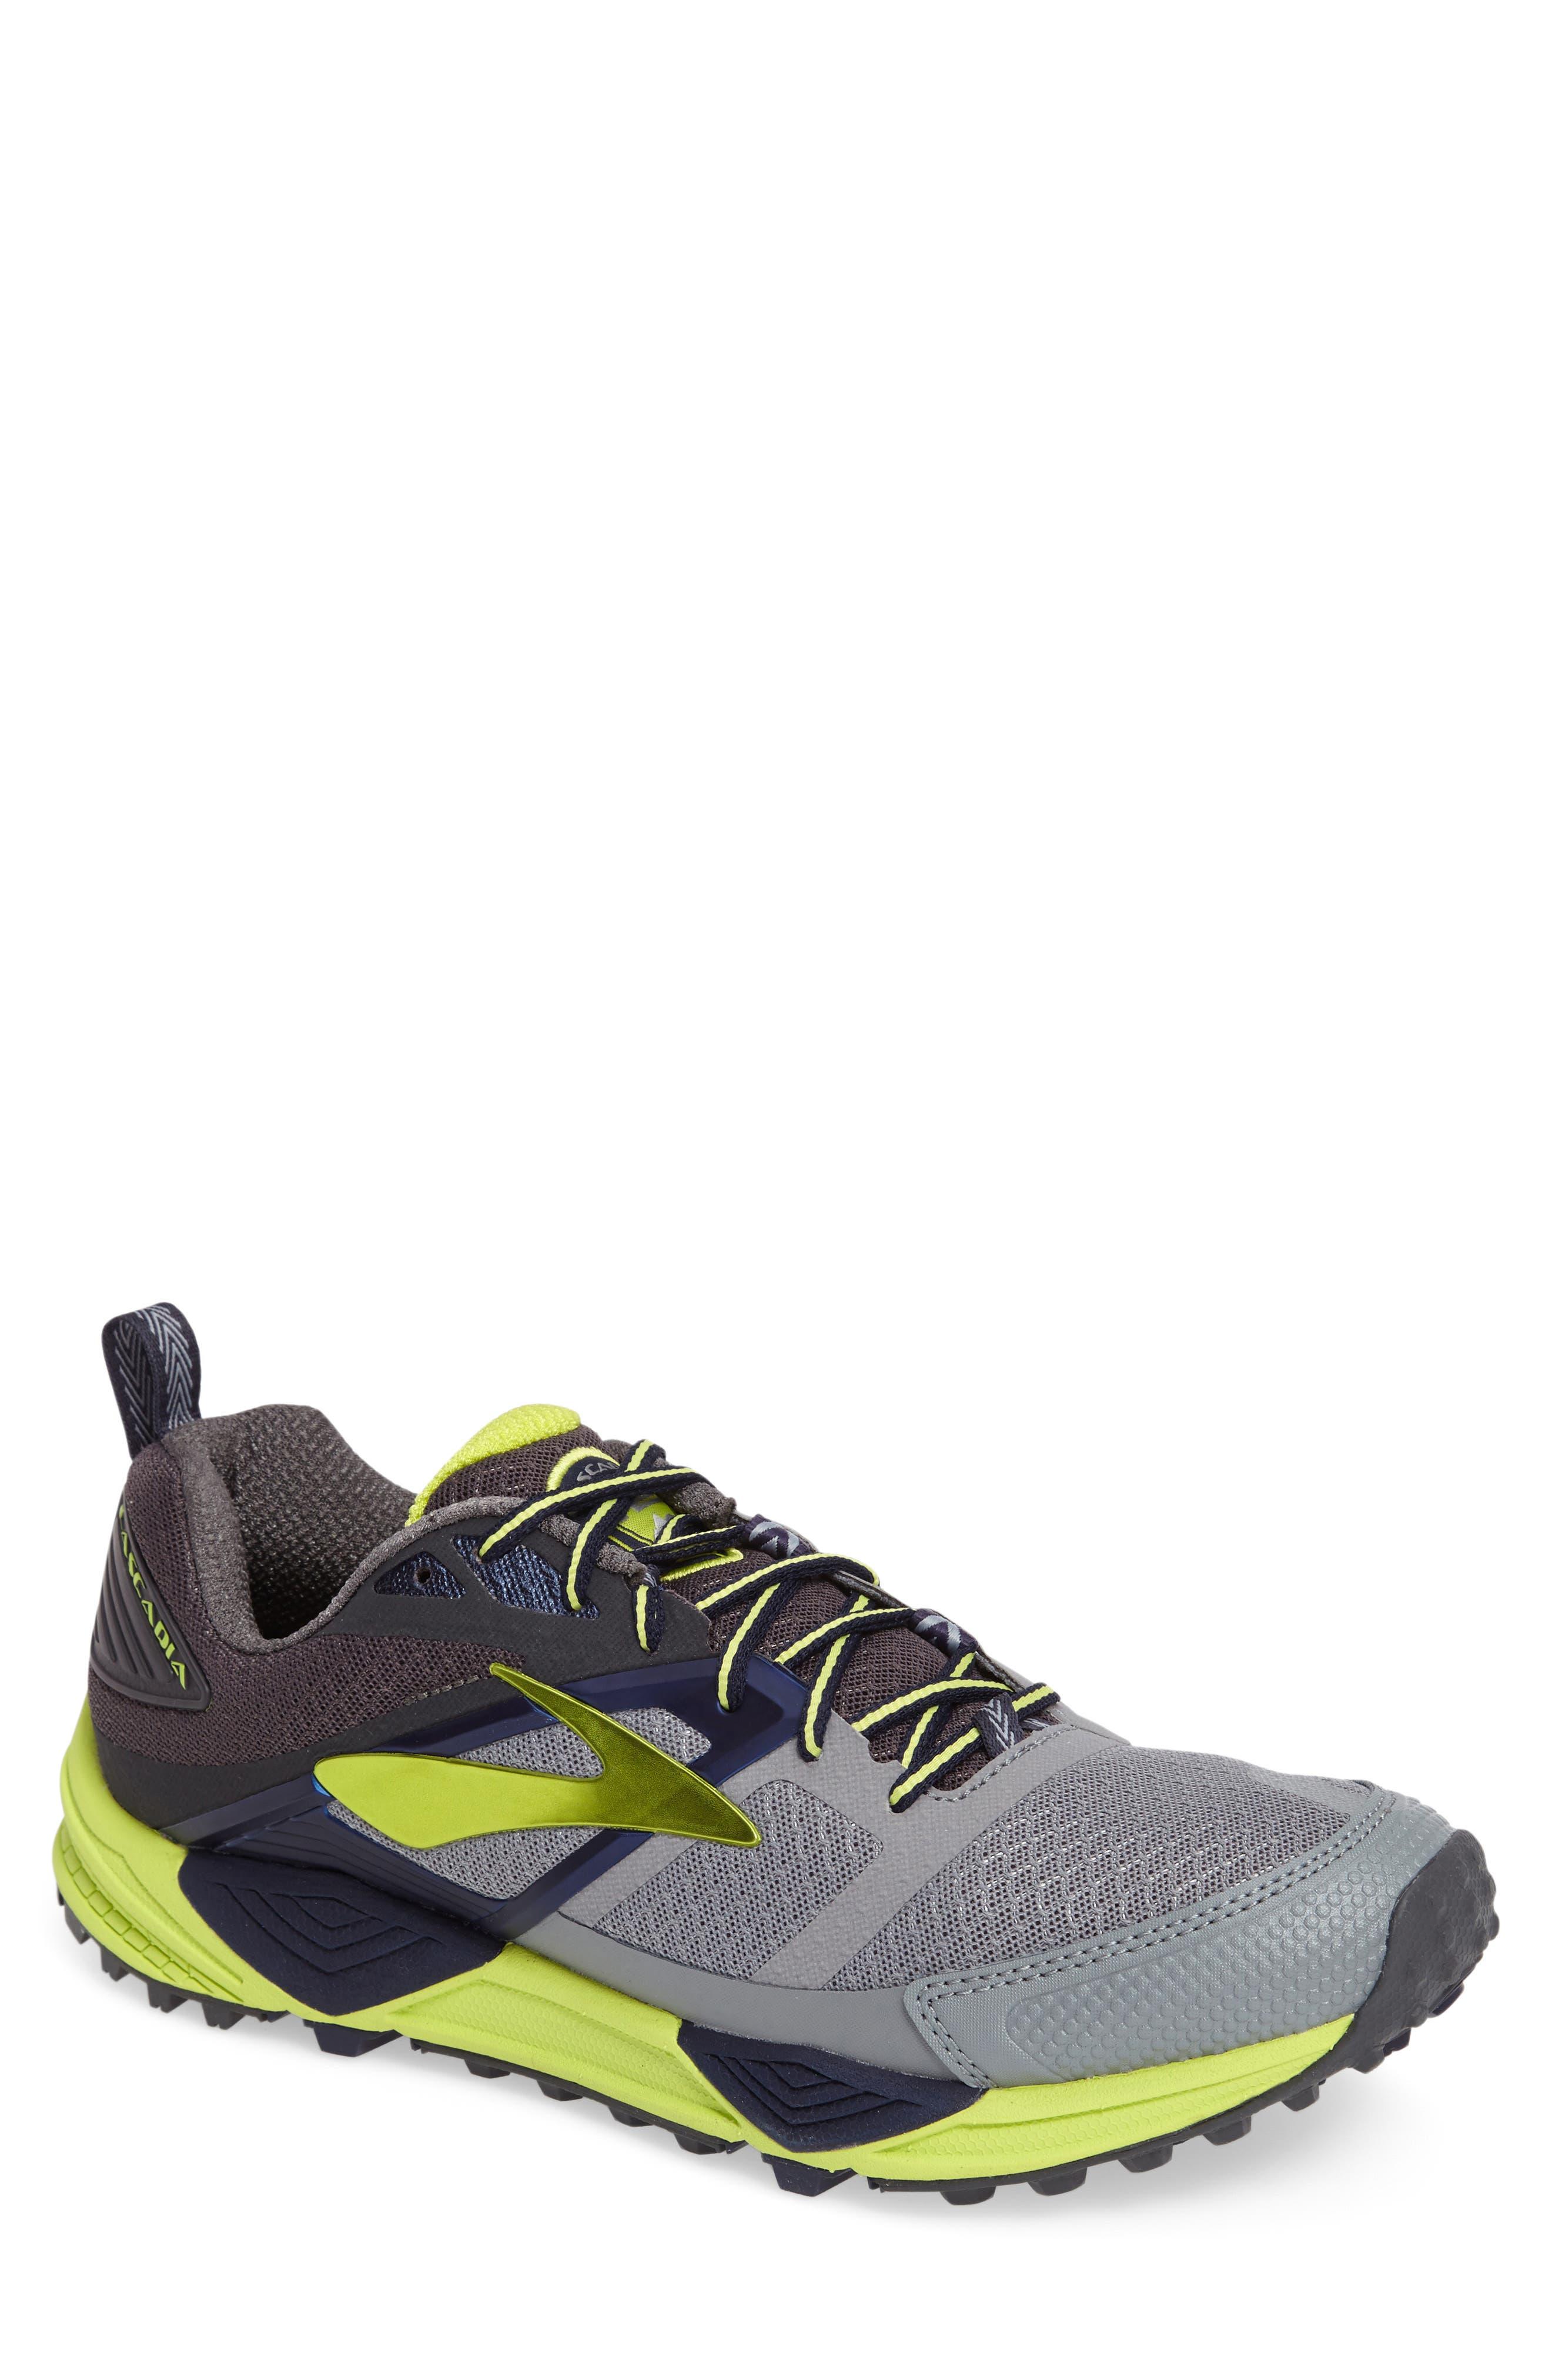 Main Image - Brooks Cascadia 12 Trail Running Shoe (Men)